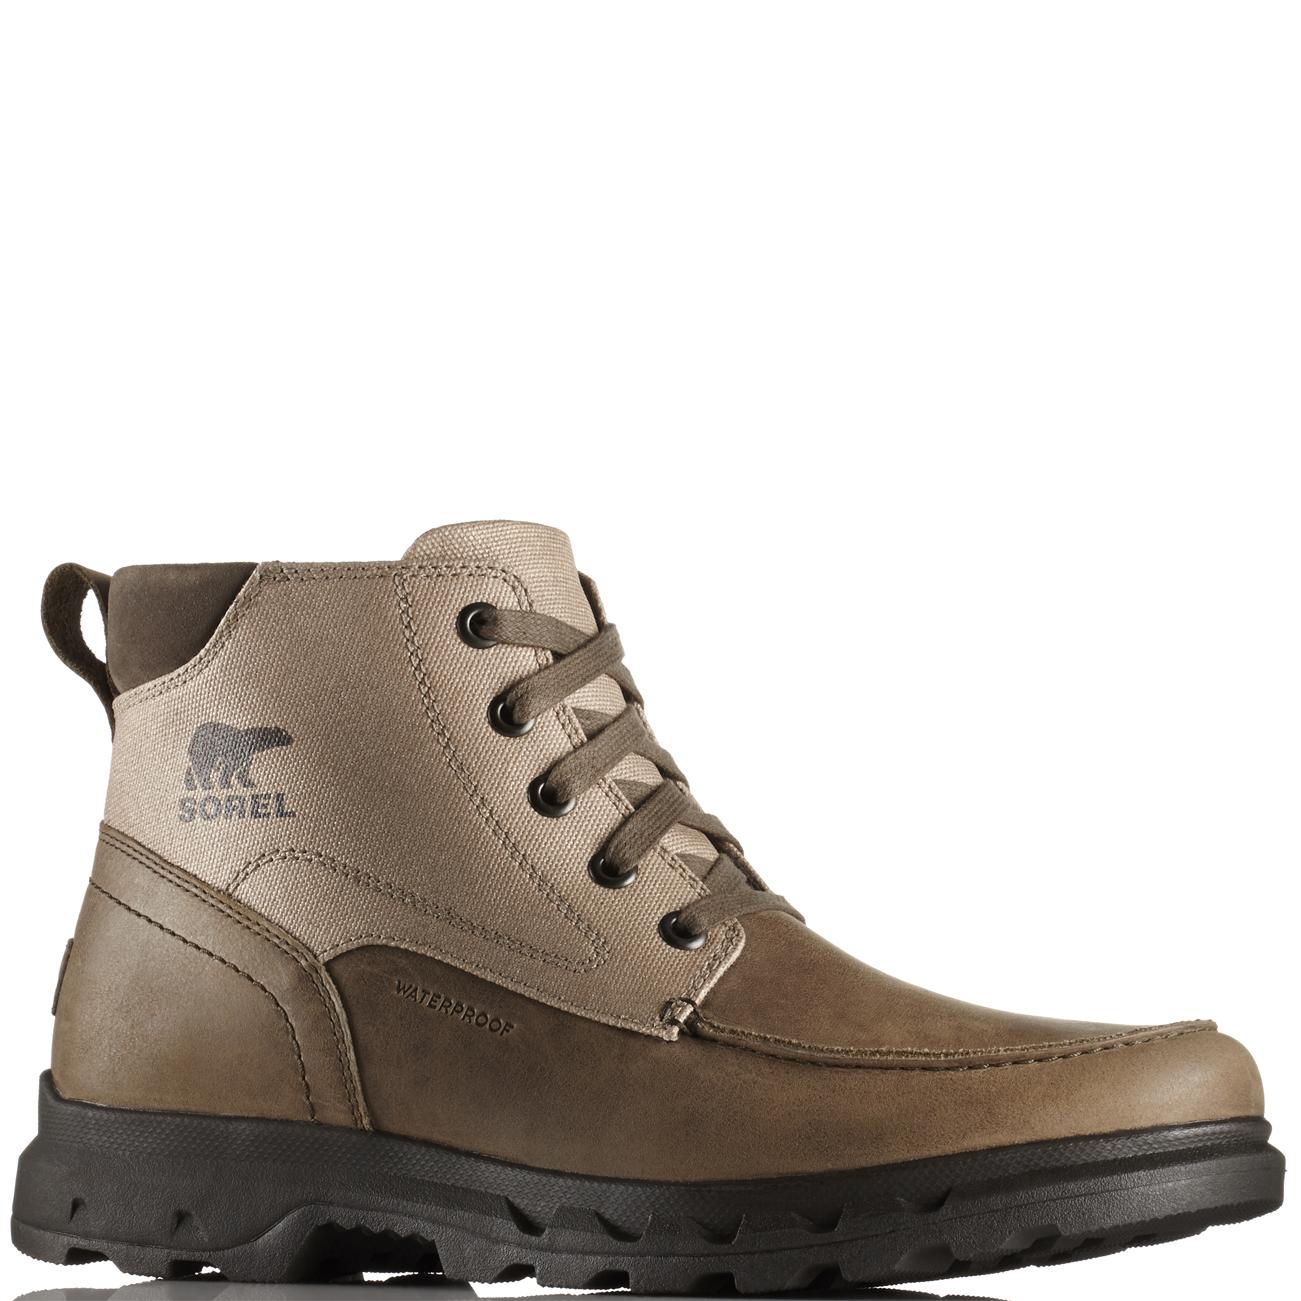 e6ebc4fc2aaa Mens Sorel Portzman MOC Toe Snow Walking Trekking Mountain Ankle ...